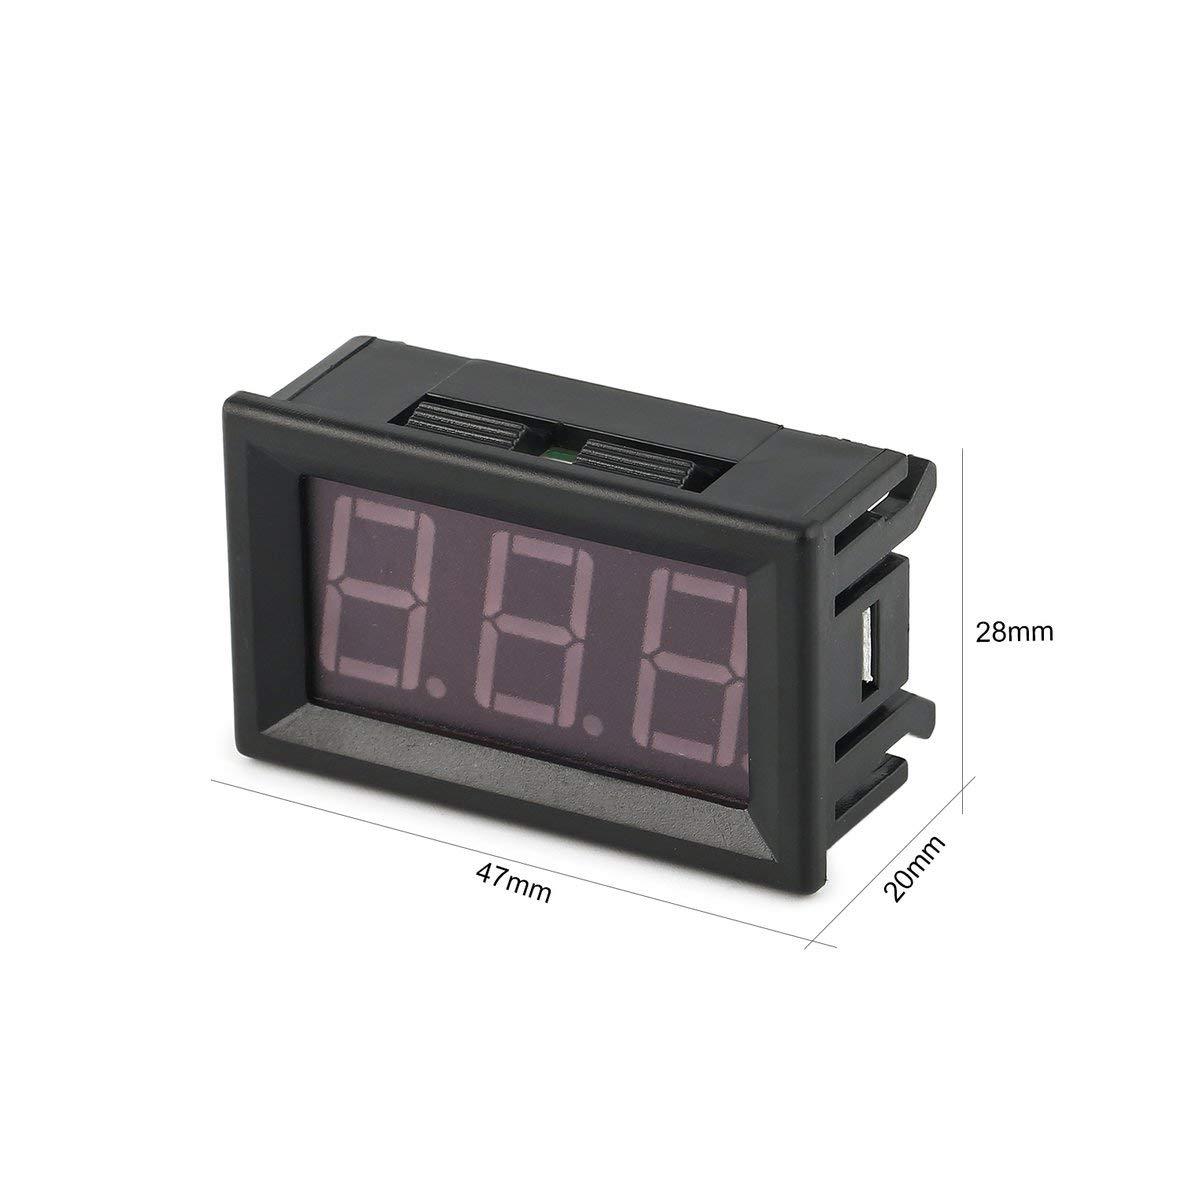 Heaviesk Digital Voltage Meter 0-100V 0.56in 3 Wire LED Digital Display Panel Volt/ímetro Electric Voltage Meter Volt Tester para Auto Battery Car Motorcycle